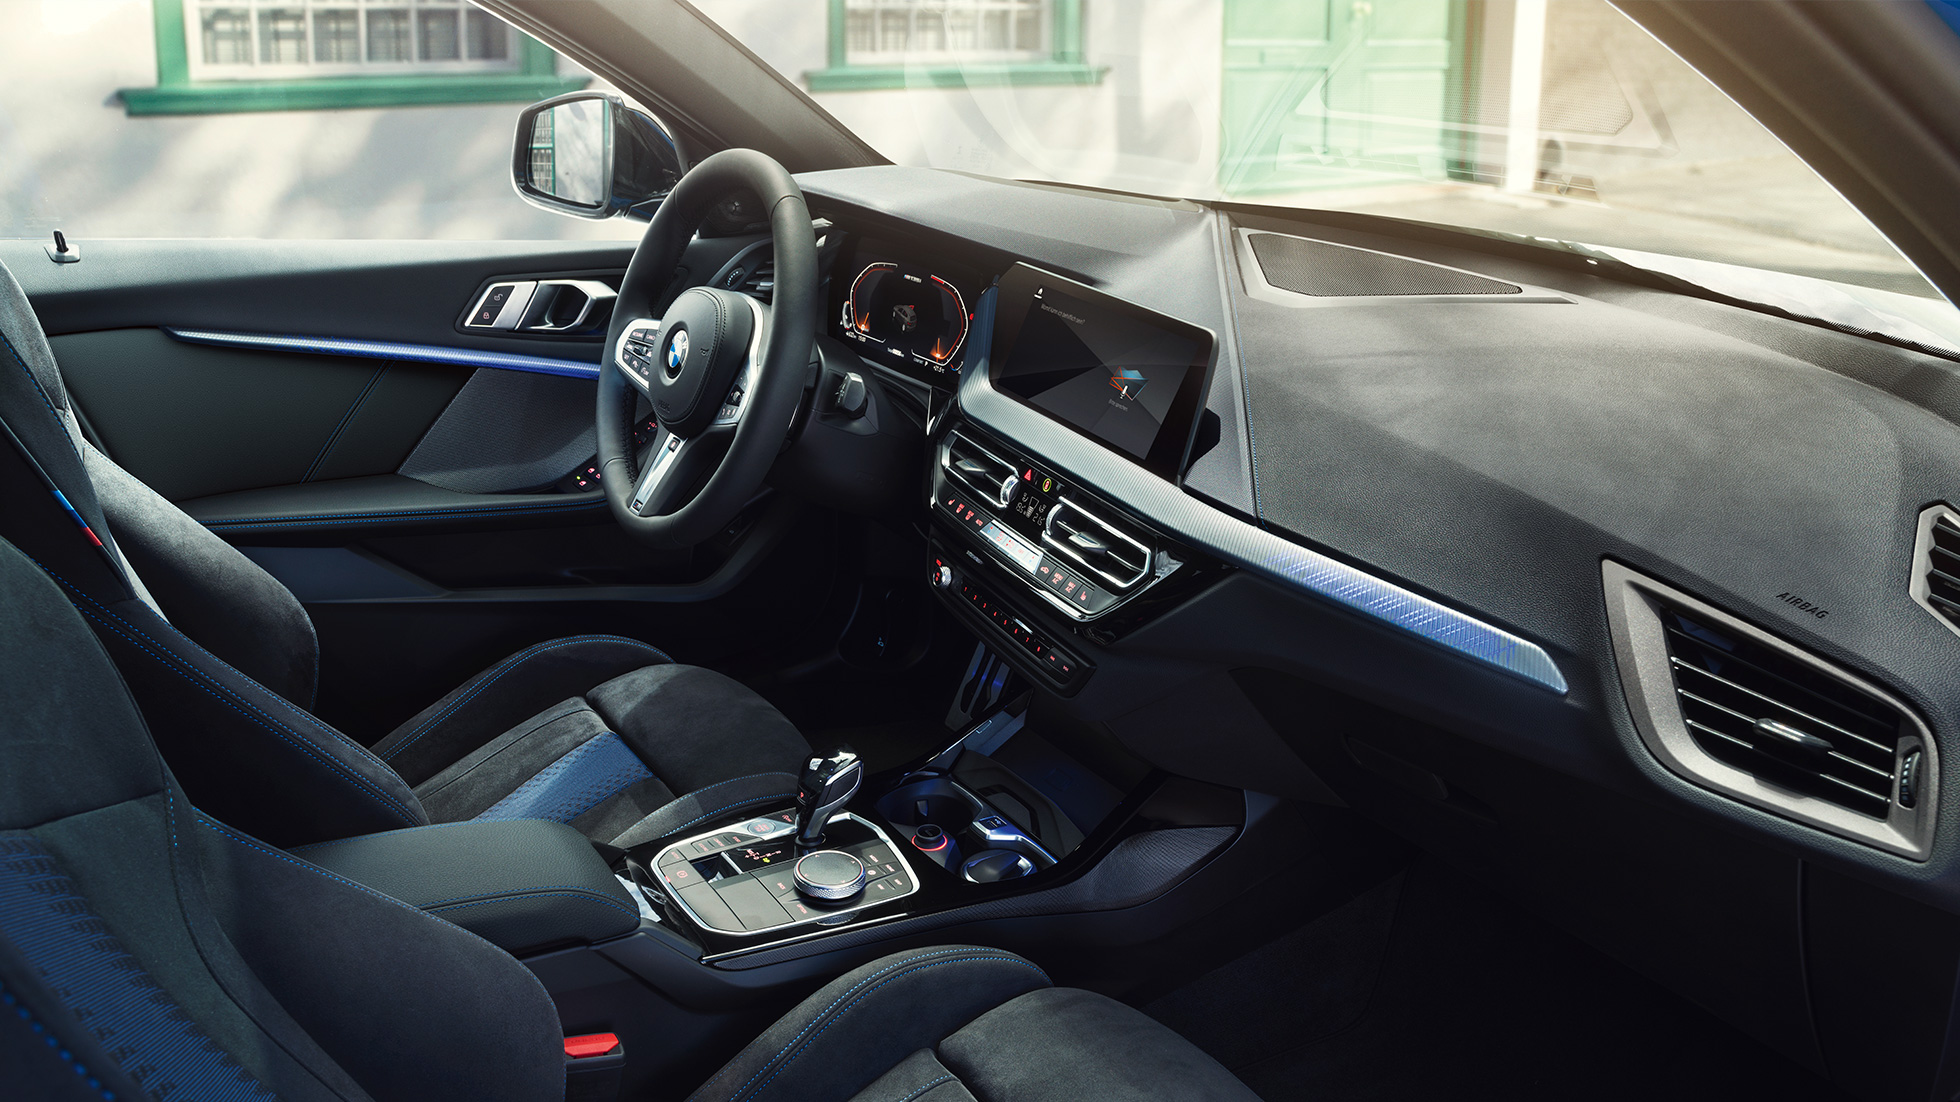 2018 - [BMW] Série 1 III [F40-F41] - Page 19 Bmw-1-series-inspire-mg-exterior-interior-desktop-05